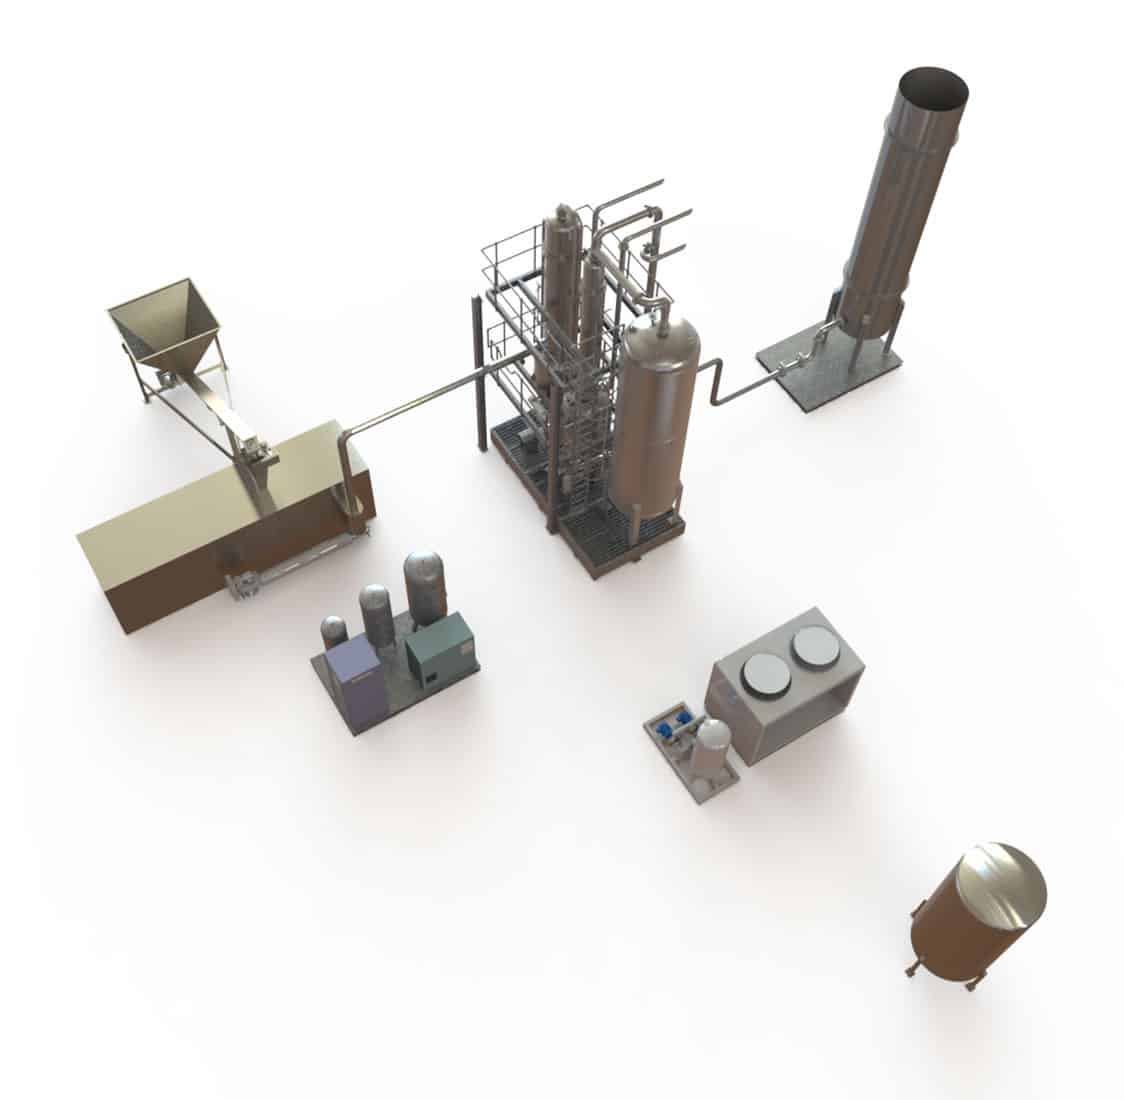 Waste-To-Energy Pyrolysis Plant Equipment - FuturEnergy